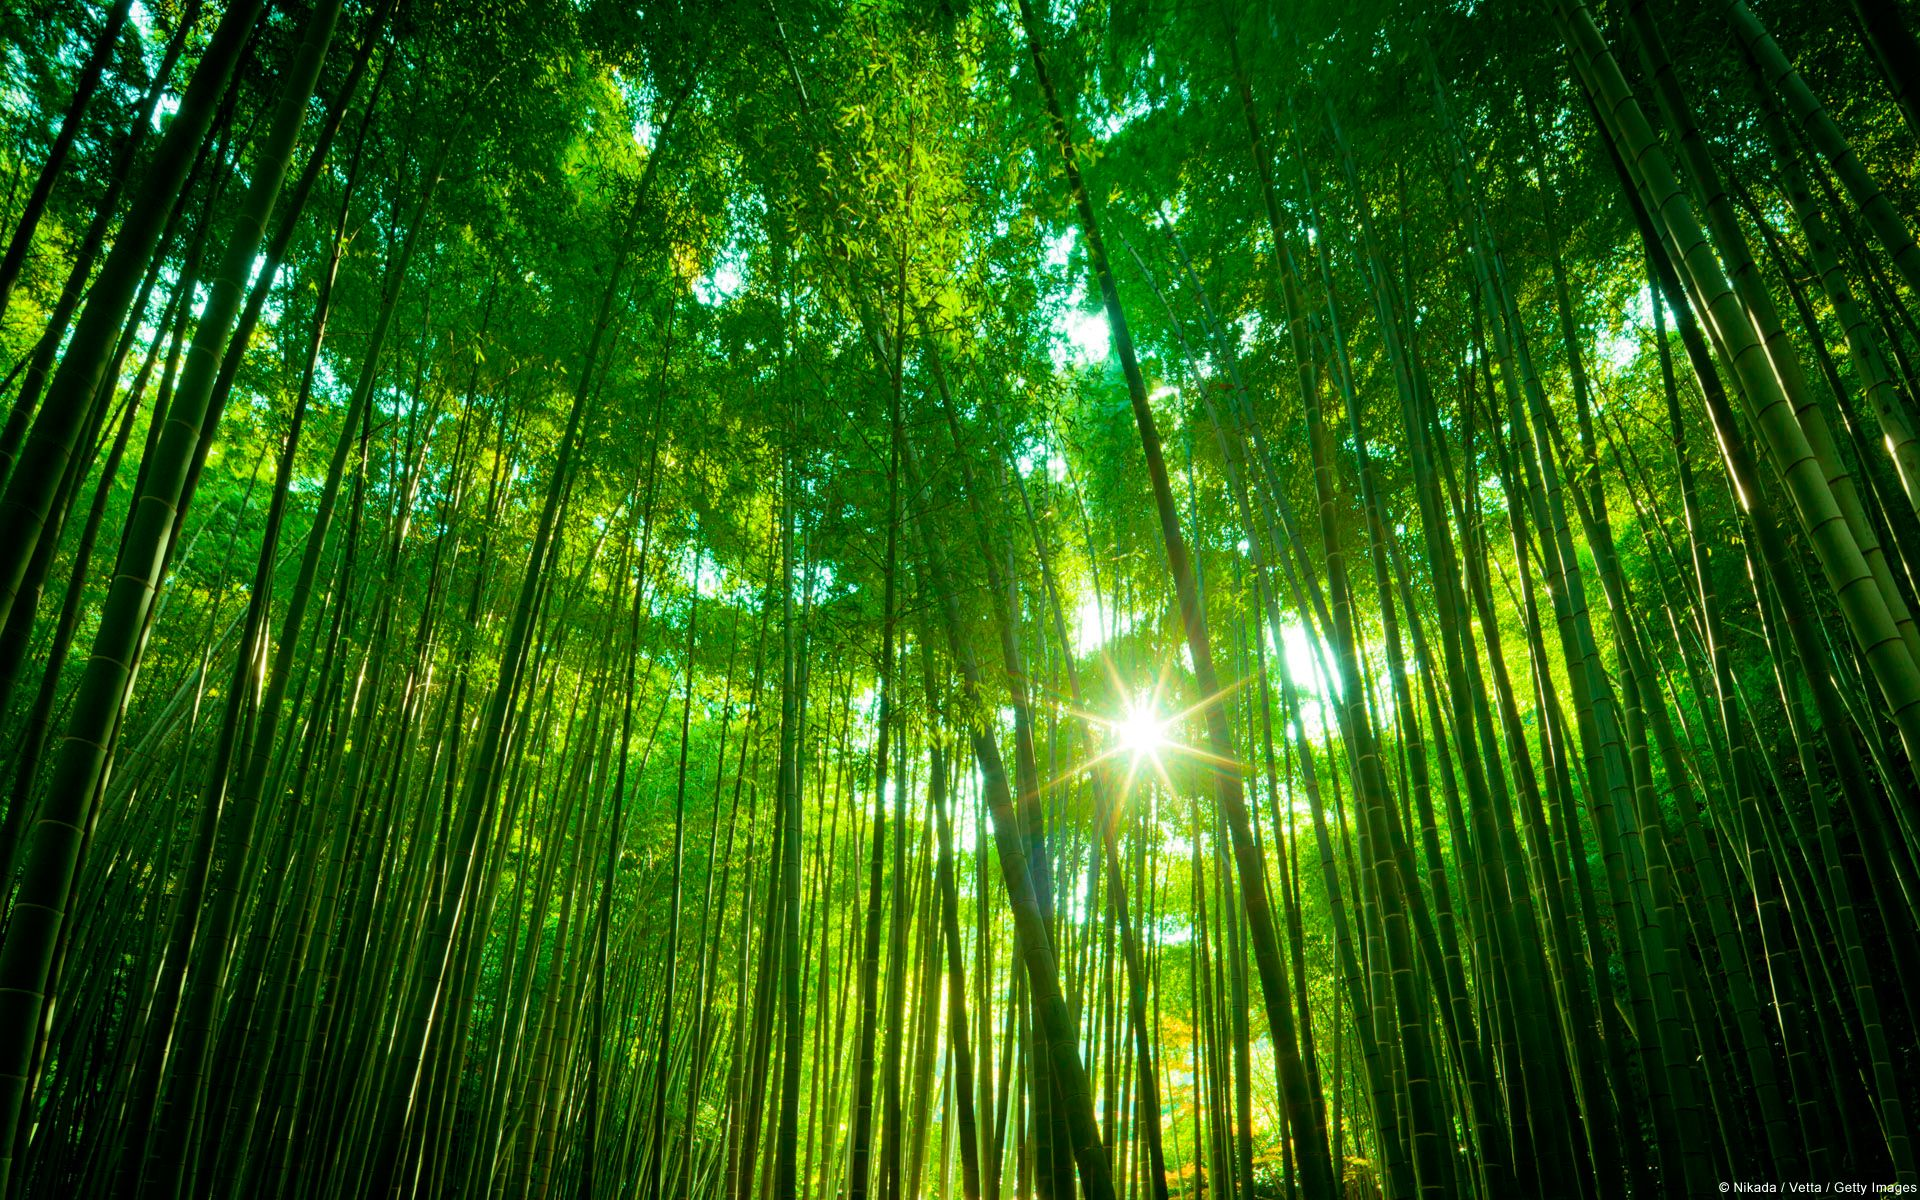 Wallpapers Windows Help Bamboo Forest Bamboo Forest Japan Backgrounds Desktop